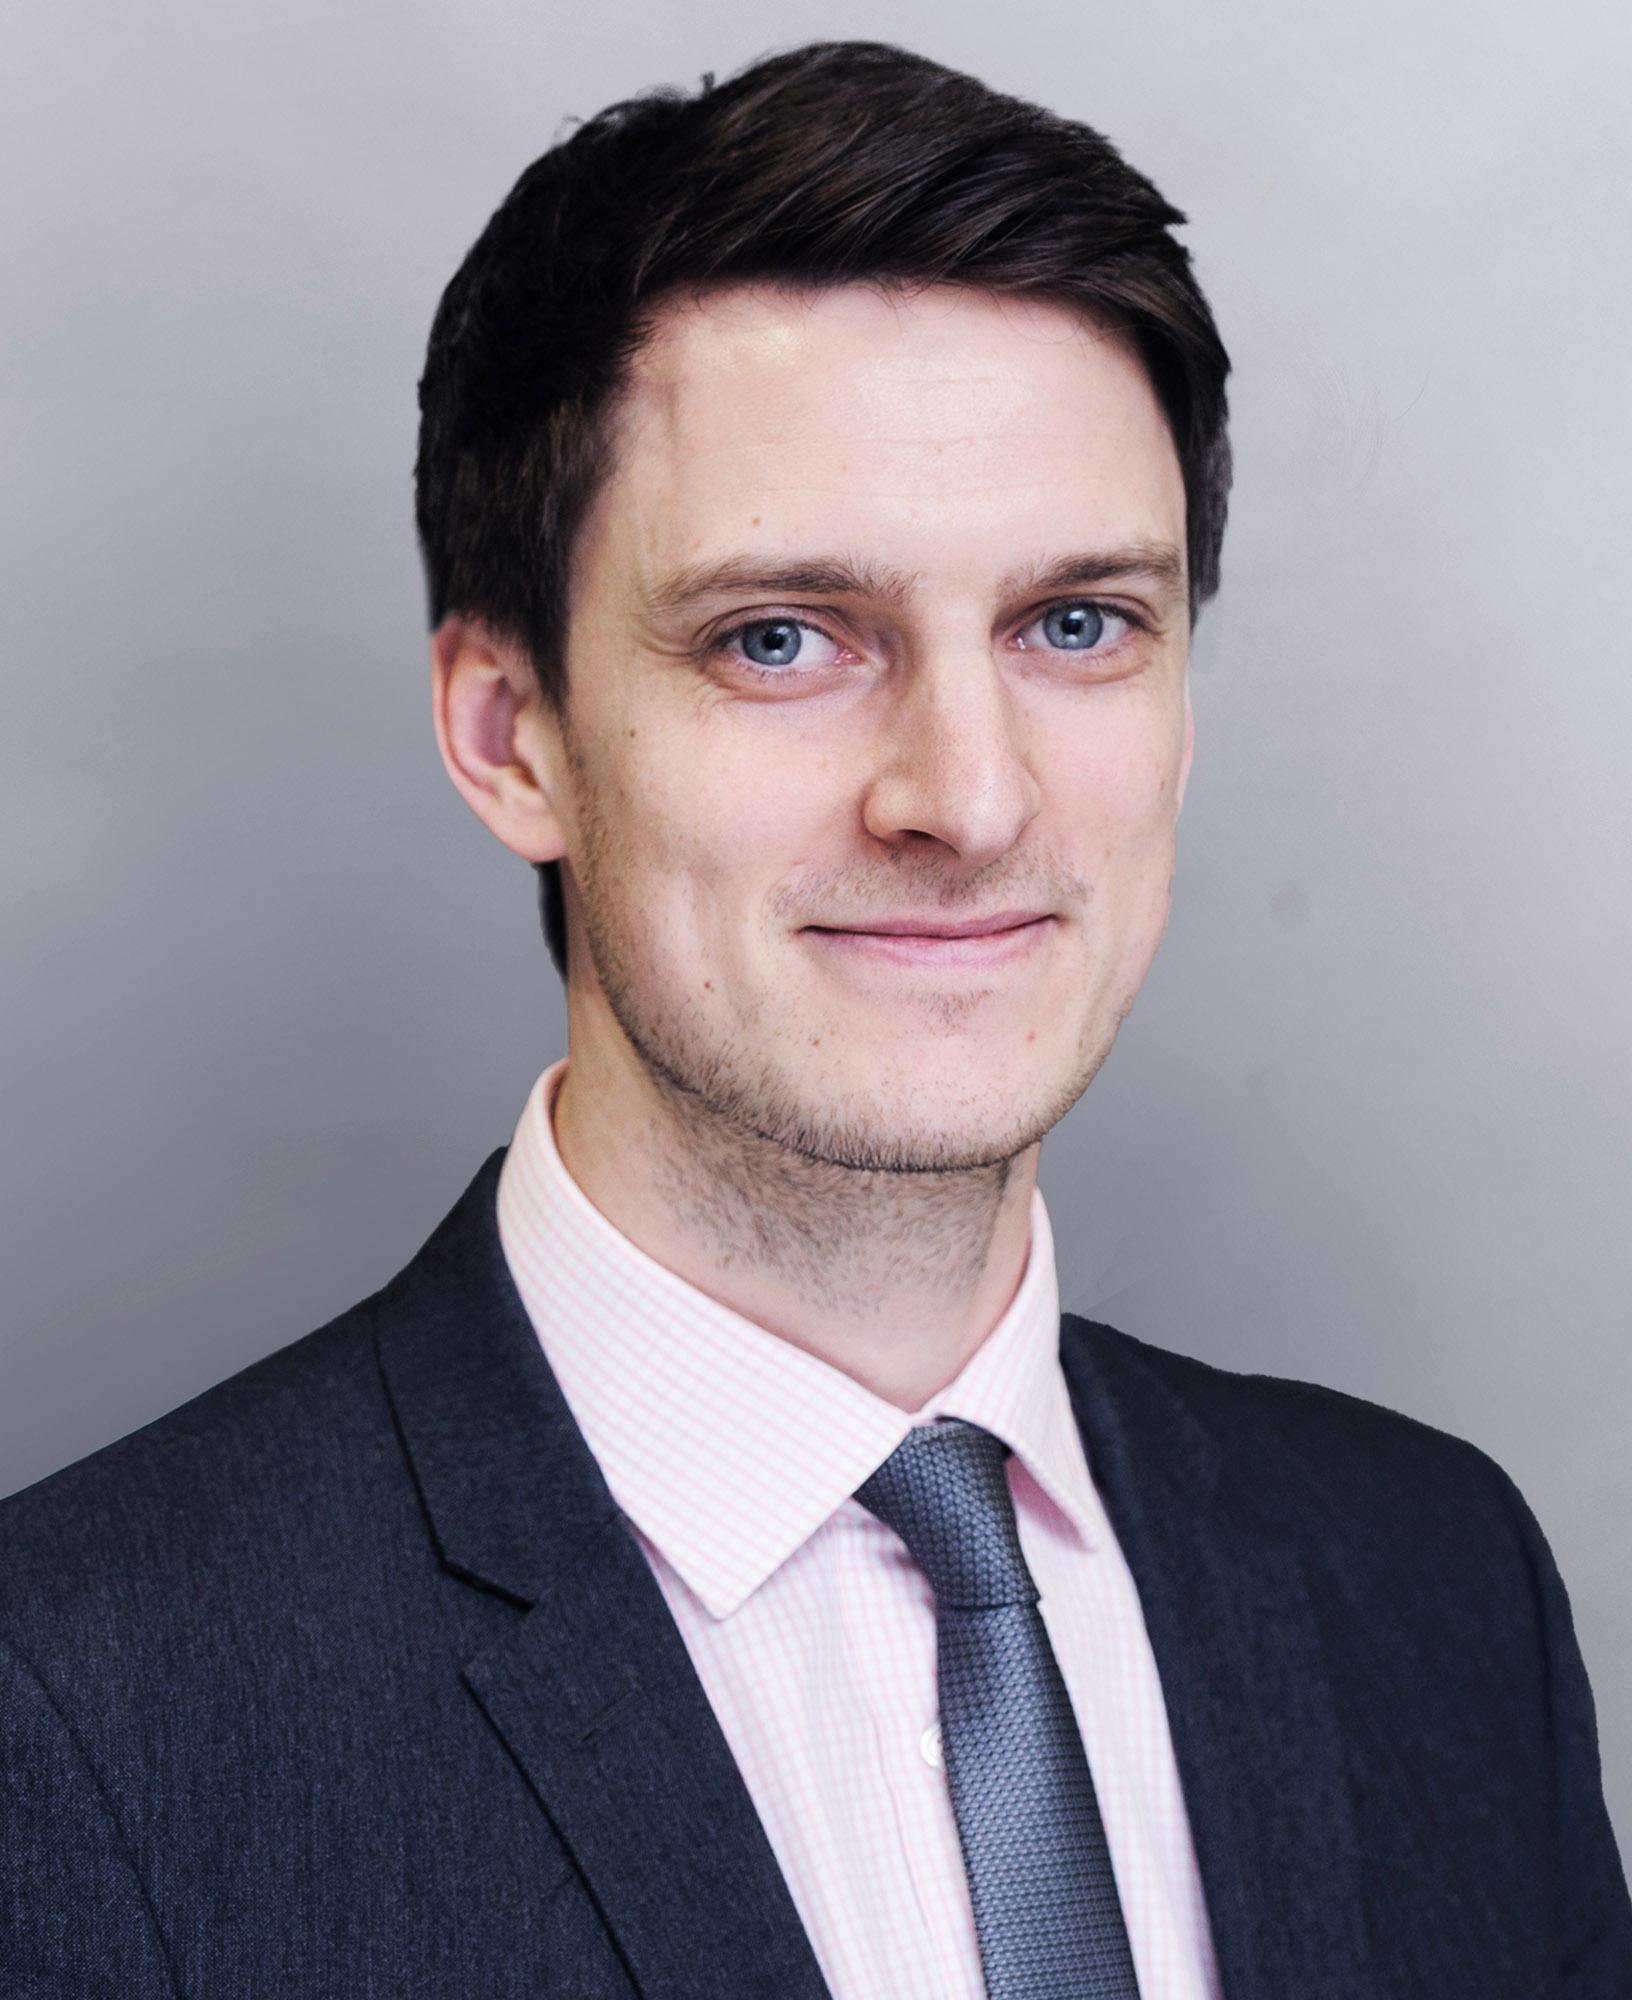 Daniel Markham